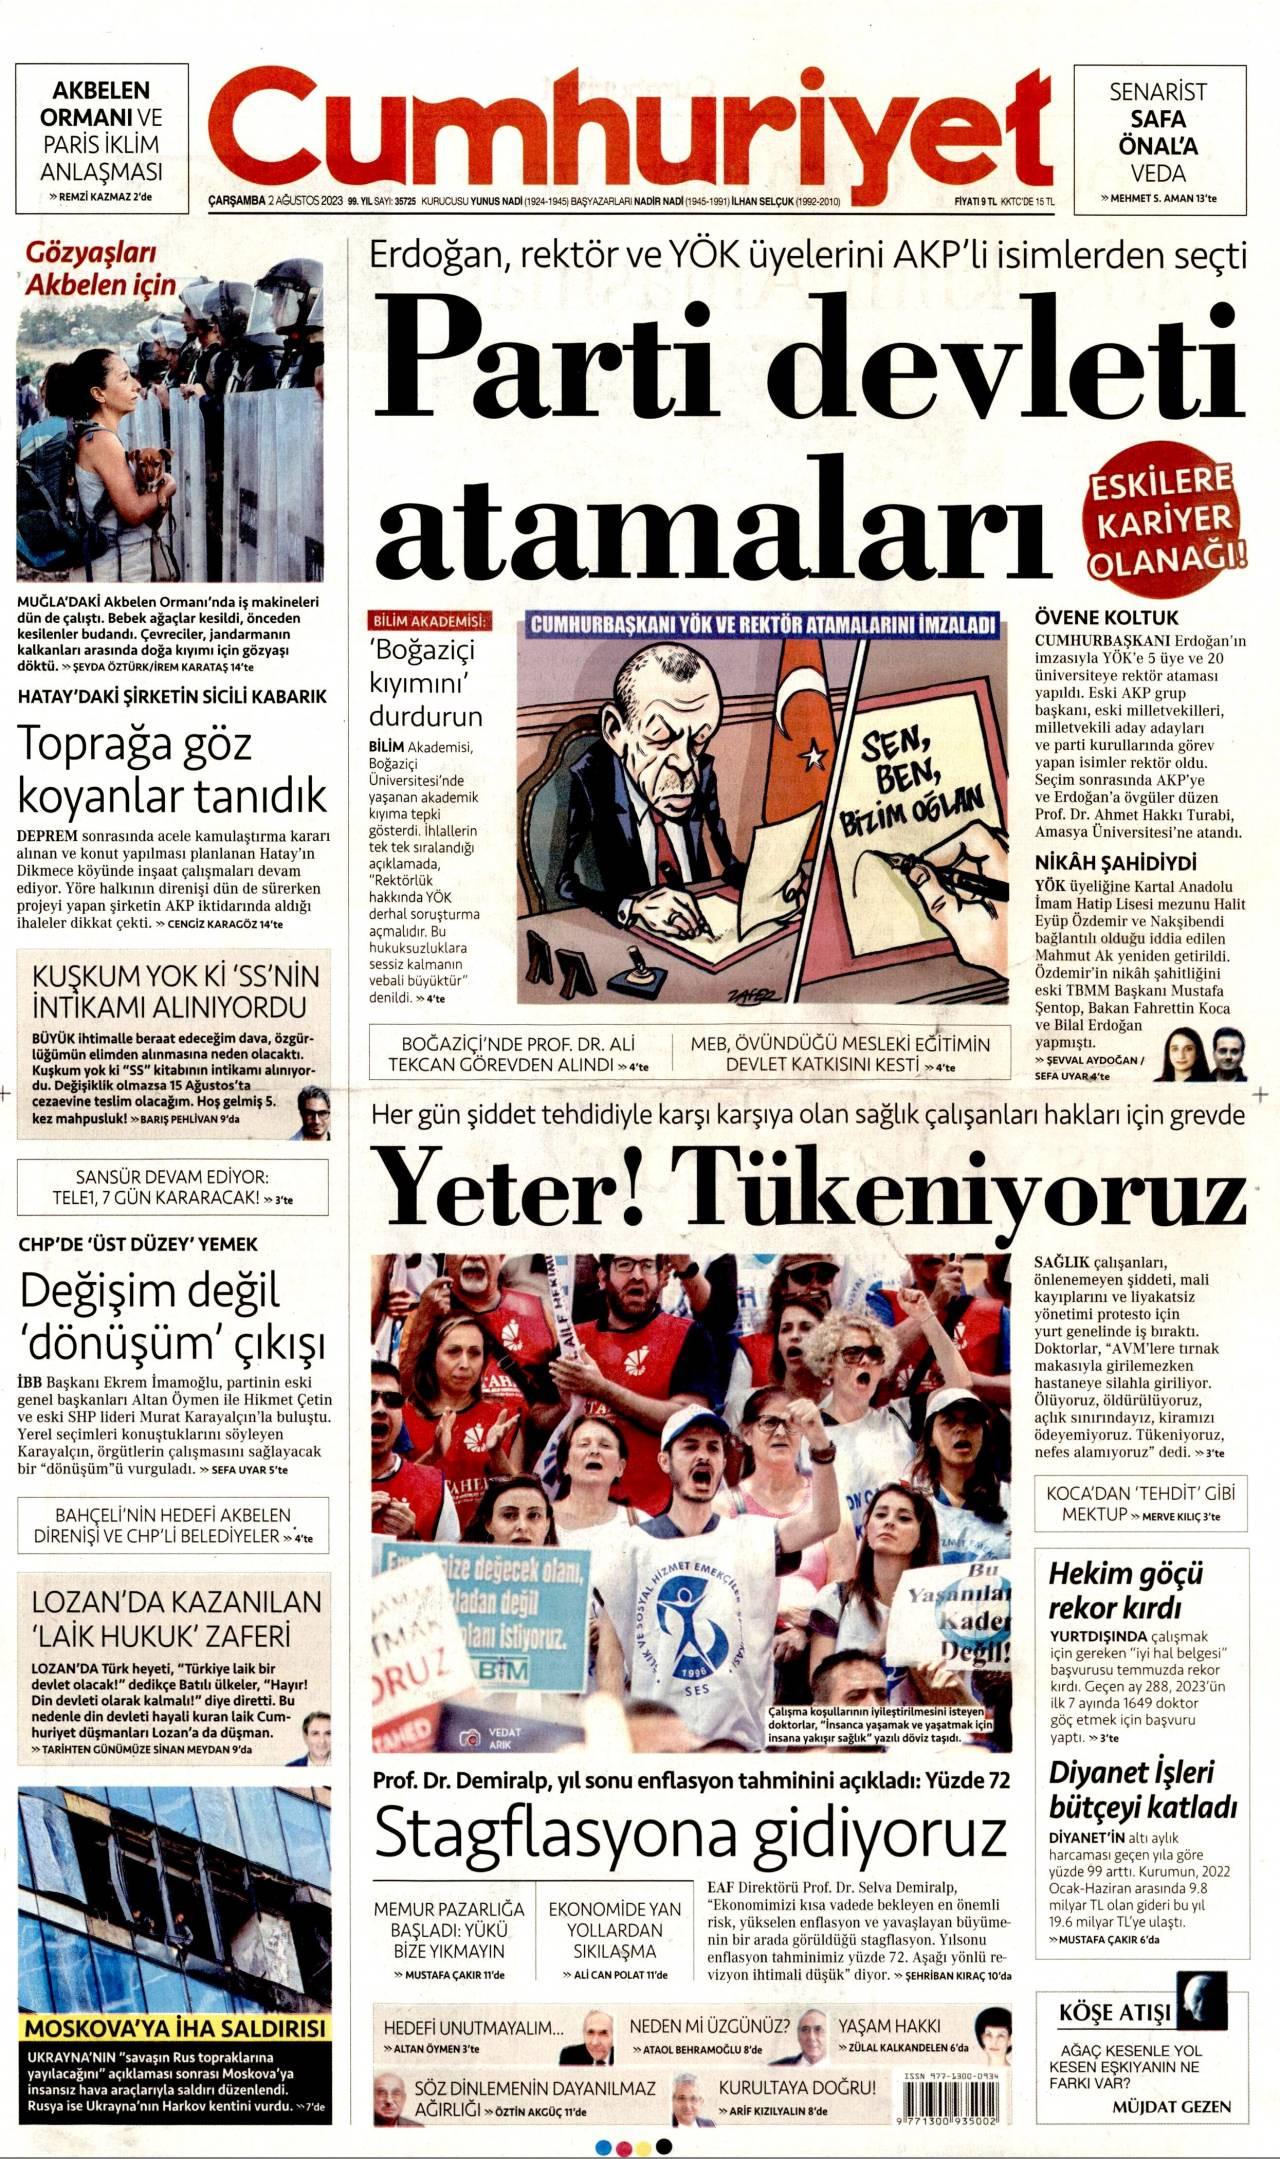 Cumhuriyet Gazetesi Gazetesi